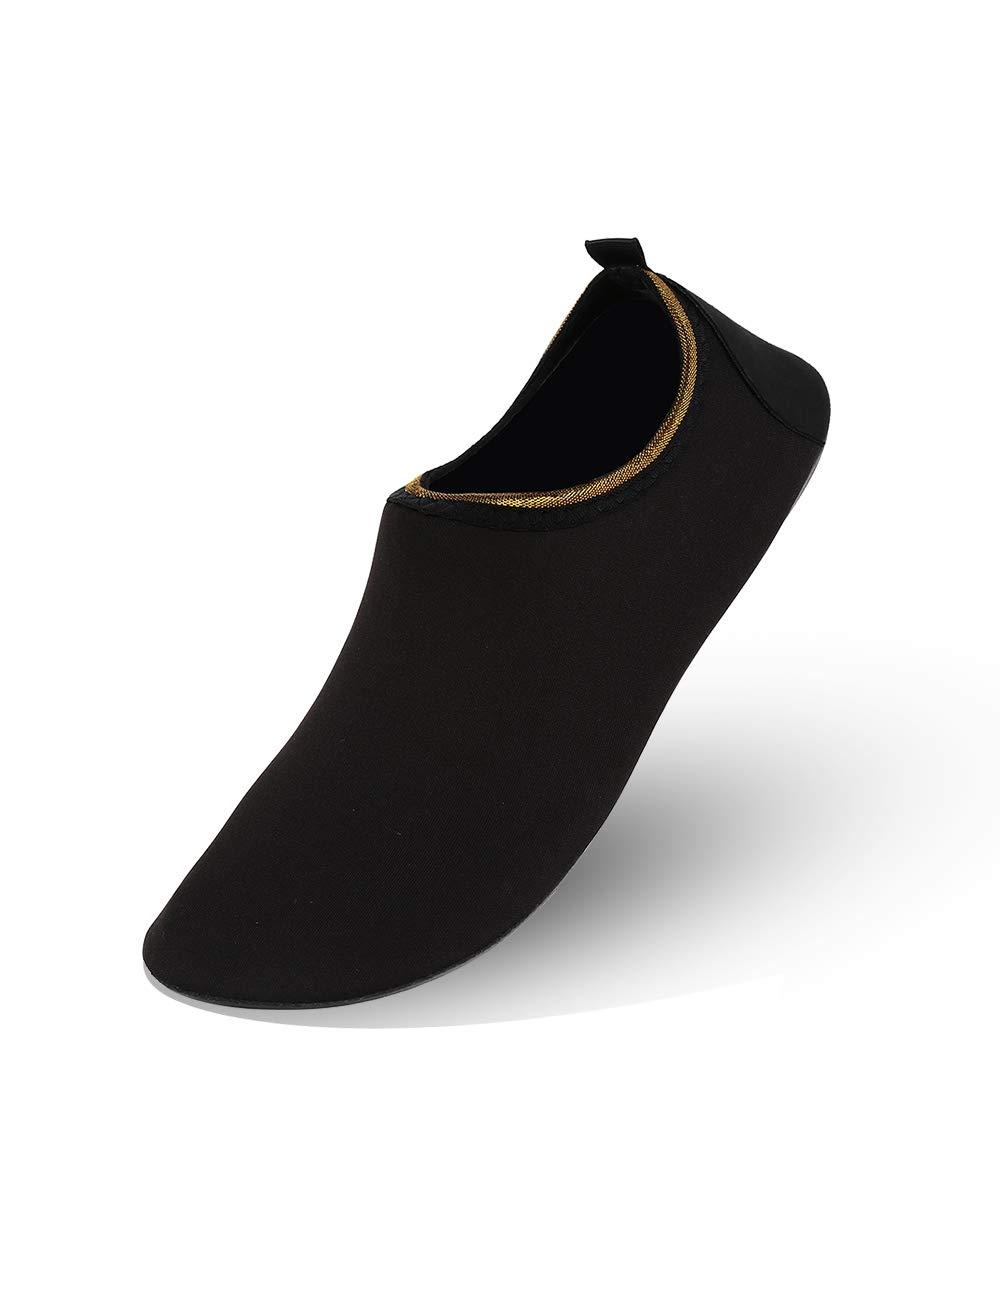 MANYITE Unisex Lightweight Water Shoes Anti-Slip Sole Multifunctional Comfortable for Beach Yoga Swim Exercise (EU36/37, Black)